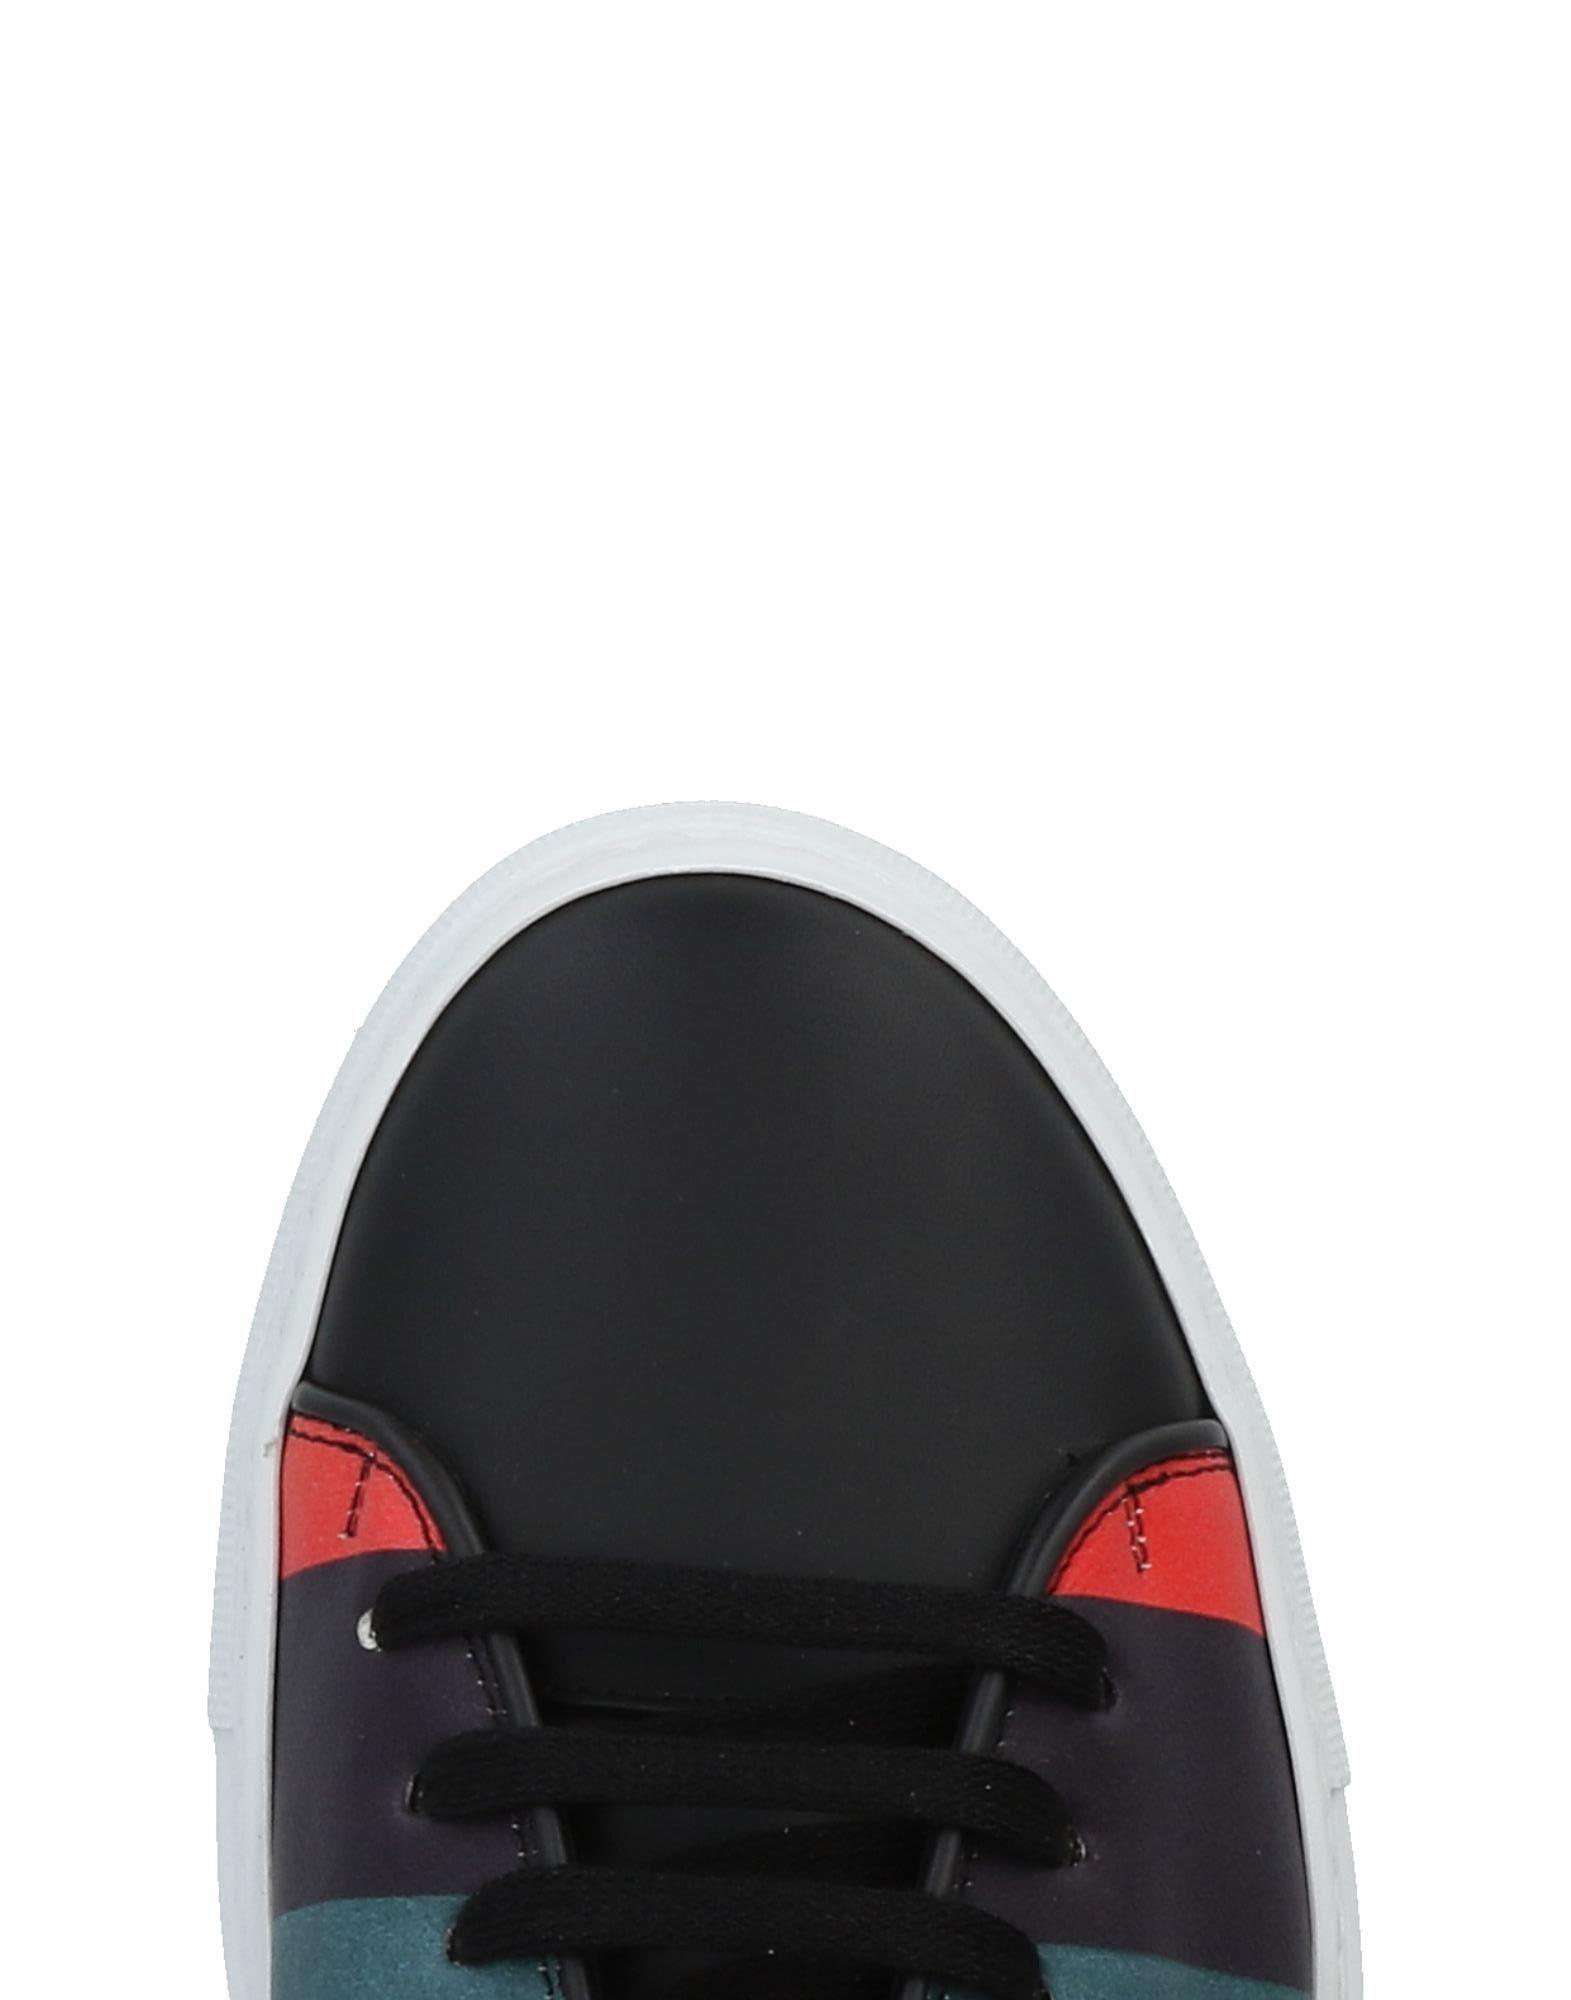 Paul Smith Sneakers Herren  11442742KQ Gute Qualität beliebte Schuhe